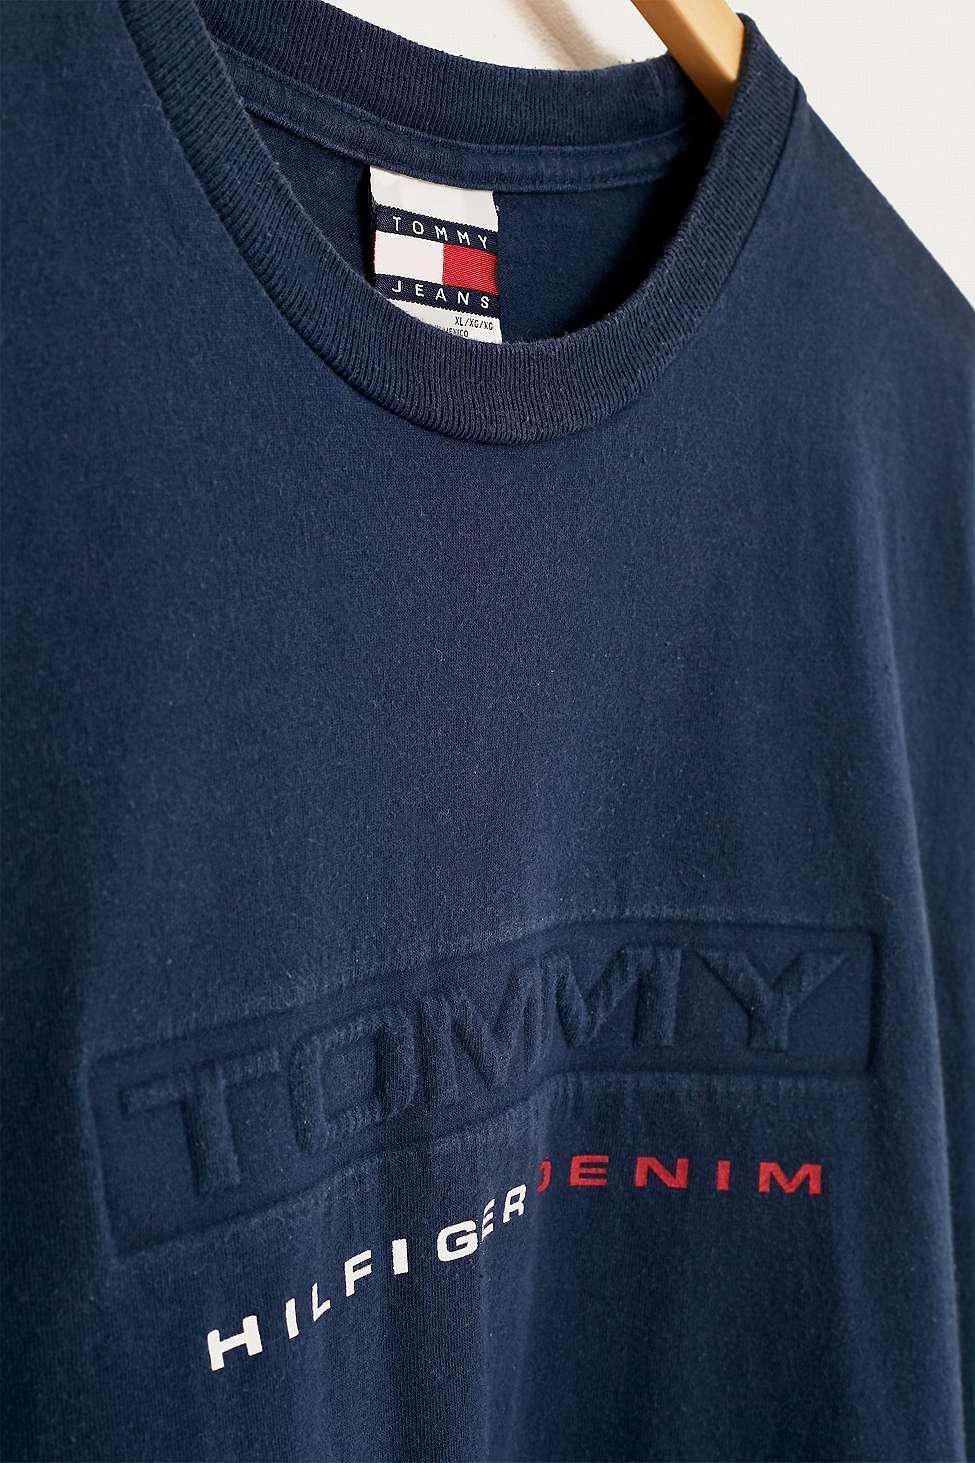 7e1a8beb Urban Renewal Vintage One-of-a-kind Tommy Hilfiger Navy T-shirt ...